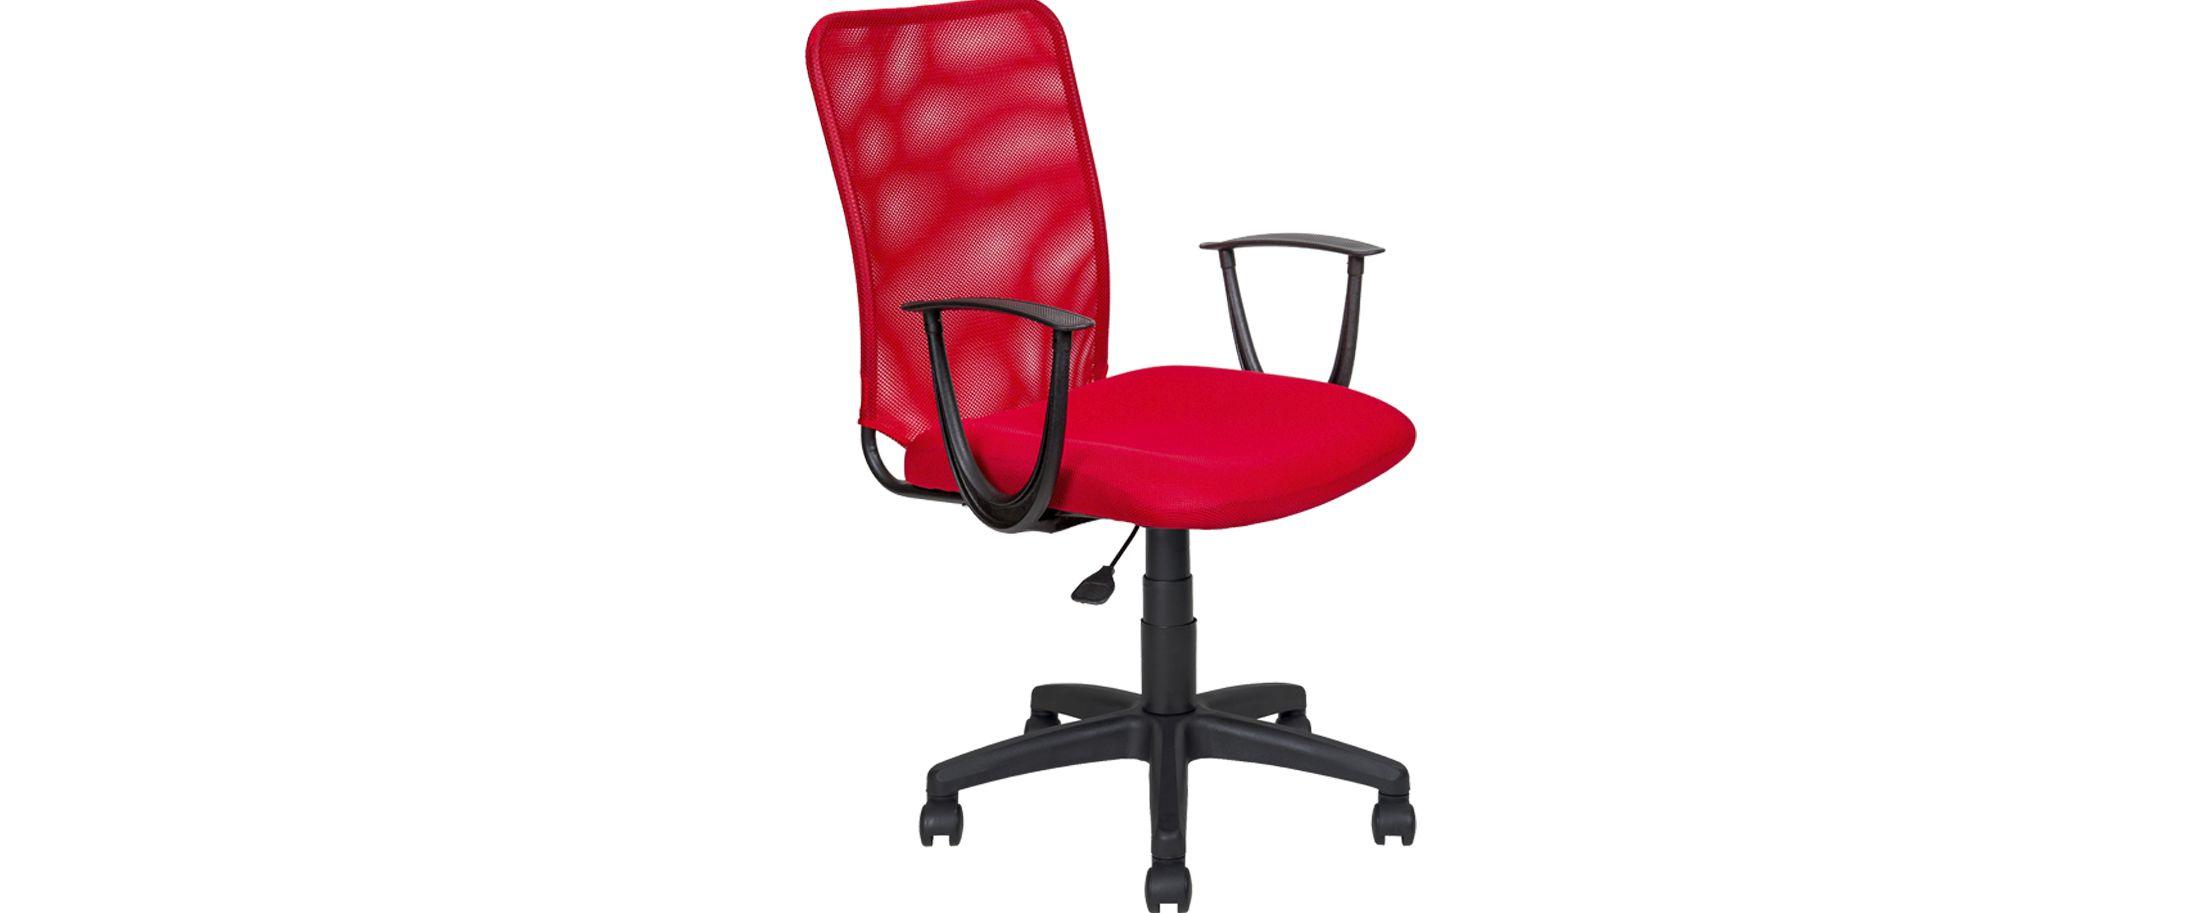 Кресло офисное AV 220 сетка красная Модель 999Кресло офисное AV 220 сетка красная Модель 999. Артикул Д000749<br>